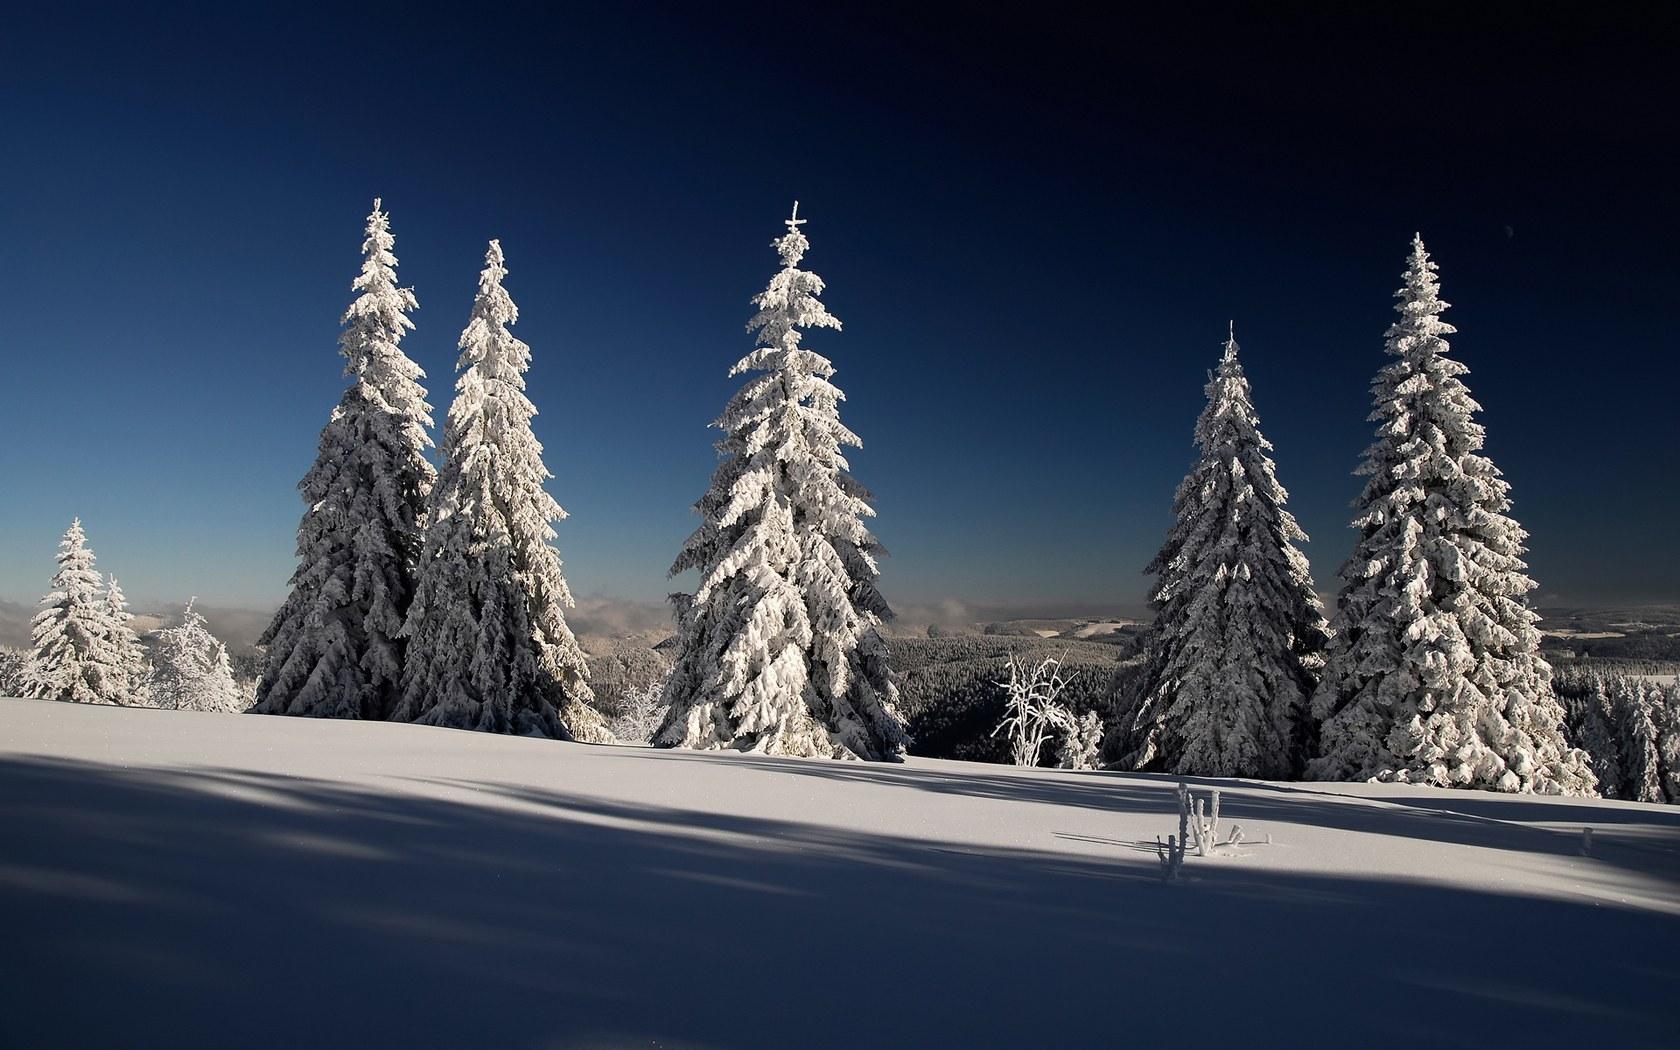 firtrees_hoarfrost_snow_shadows_branches_gray_hair_sun_dark_blue_sky__x